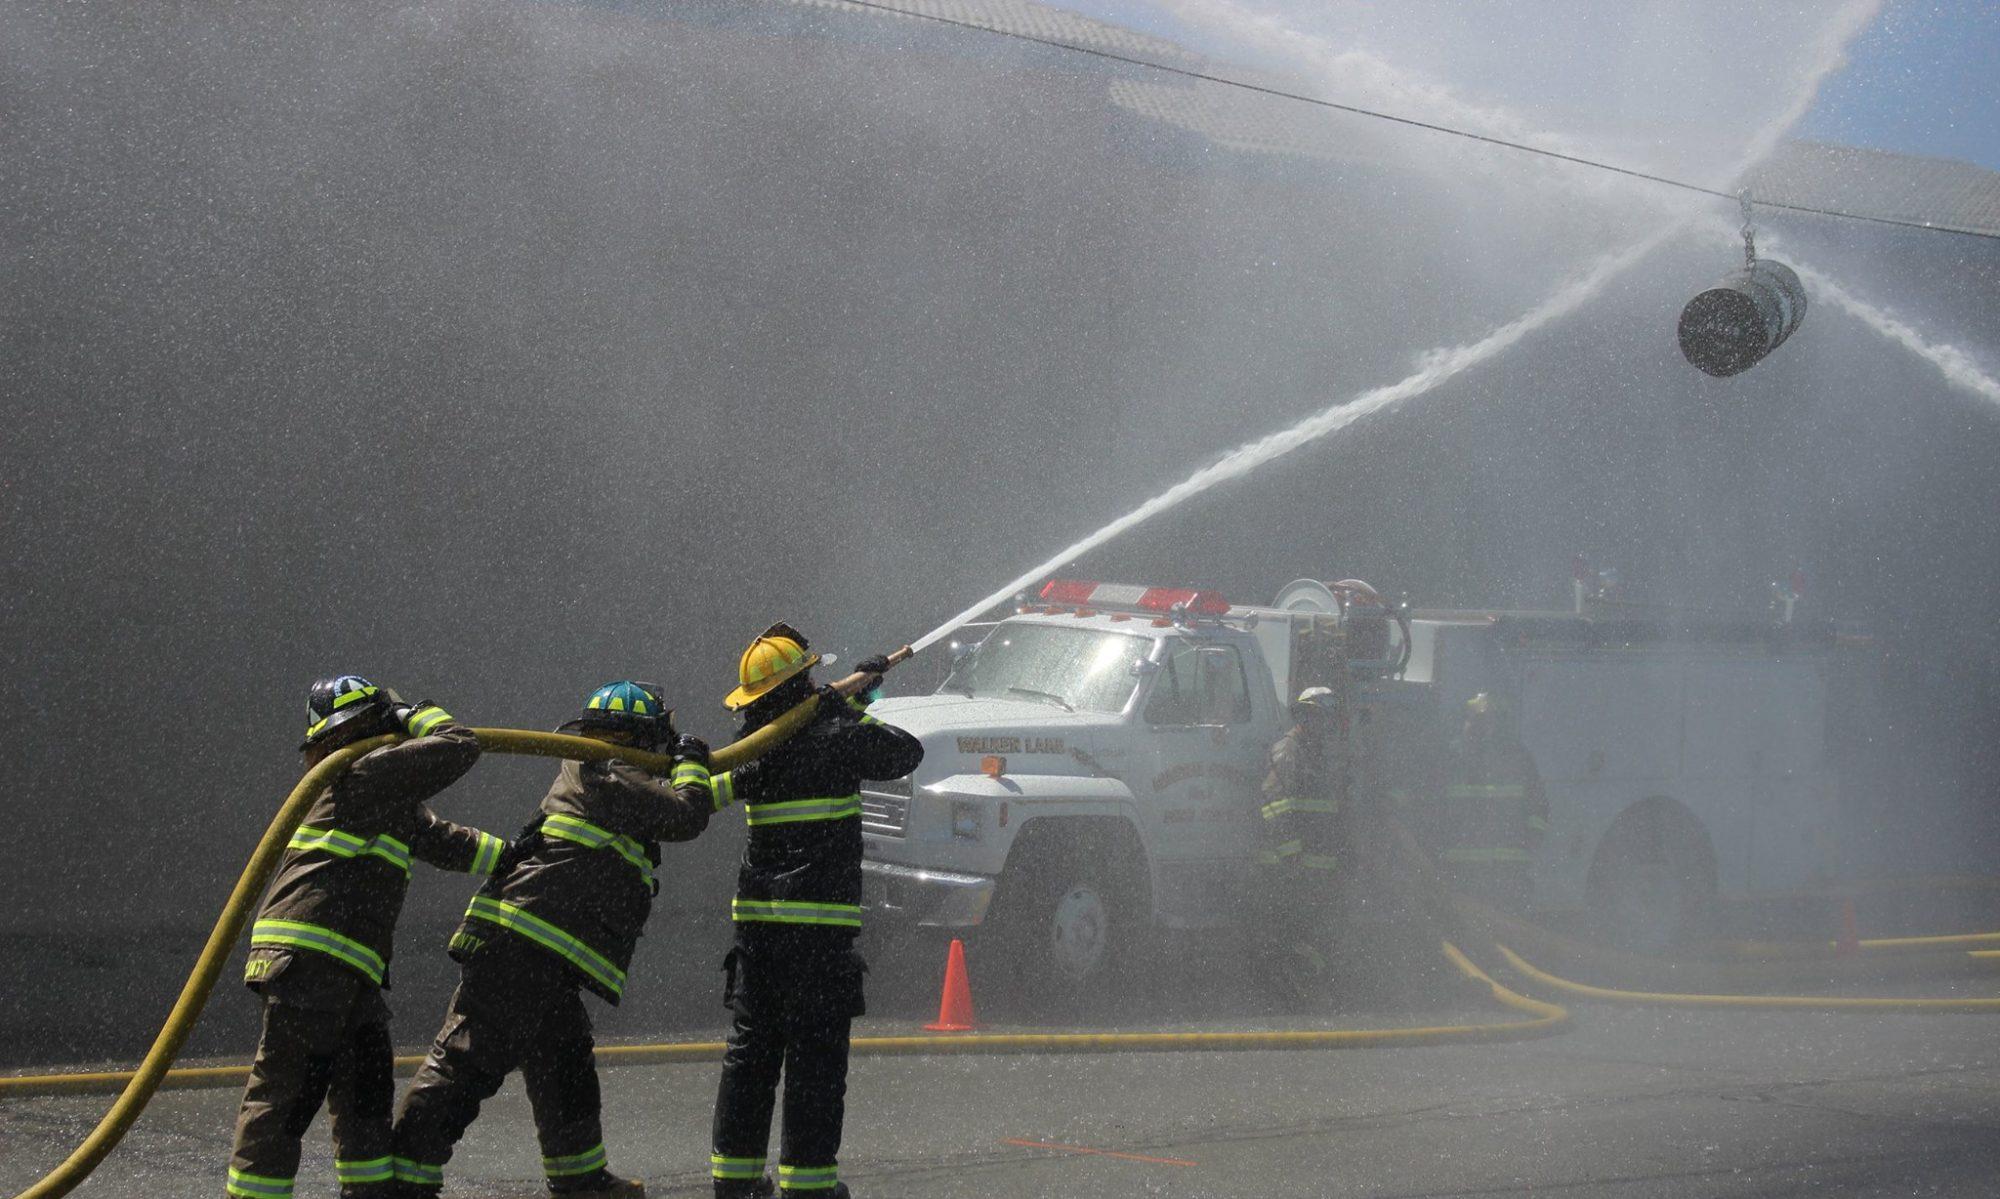 Nevada State Firefighter's Association